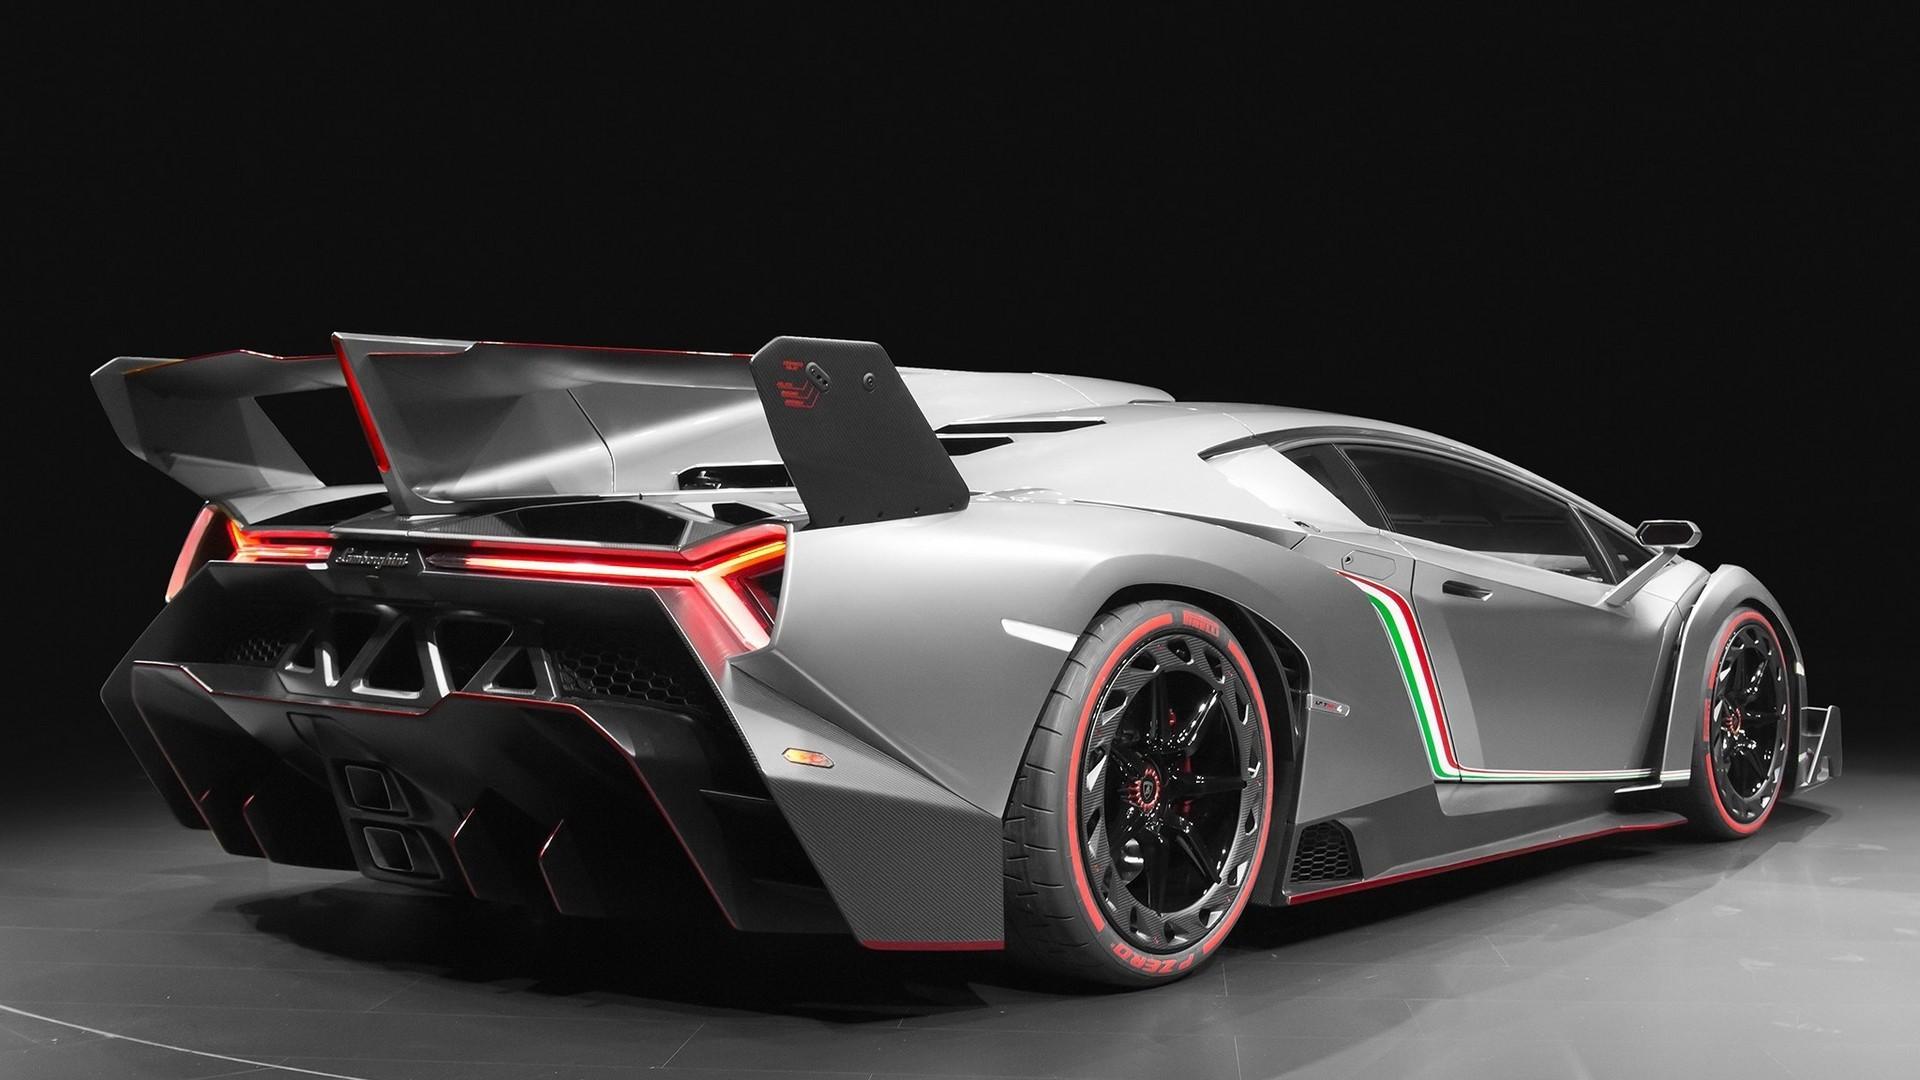 Lamborghini, Veneno, Lamborghini Veneno, Mid engine, Hypercar Wallpapers HD  / Desktop and Mobile Backgrounds